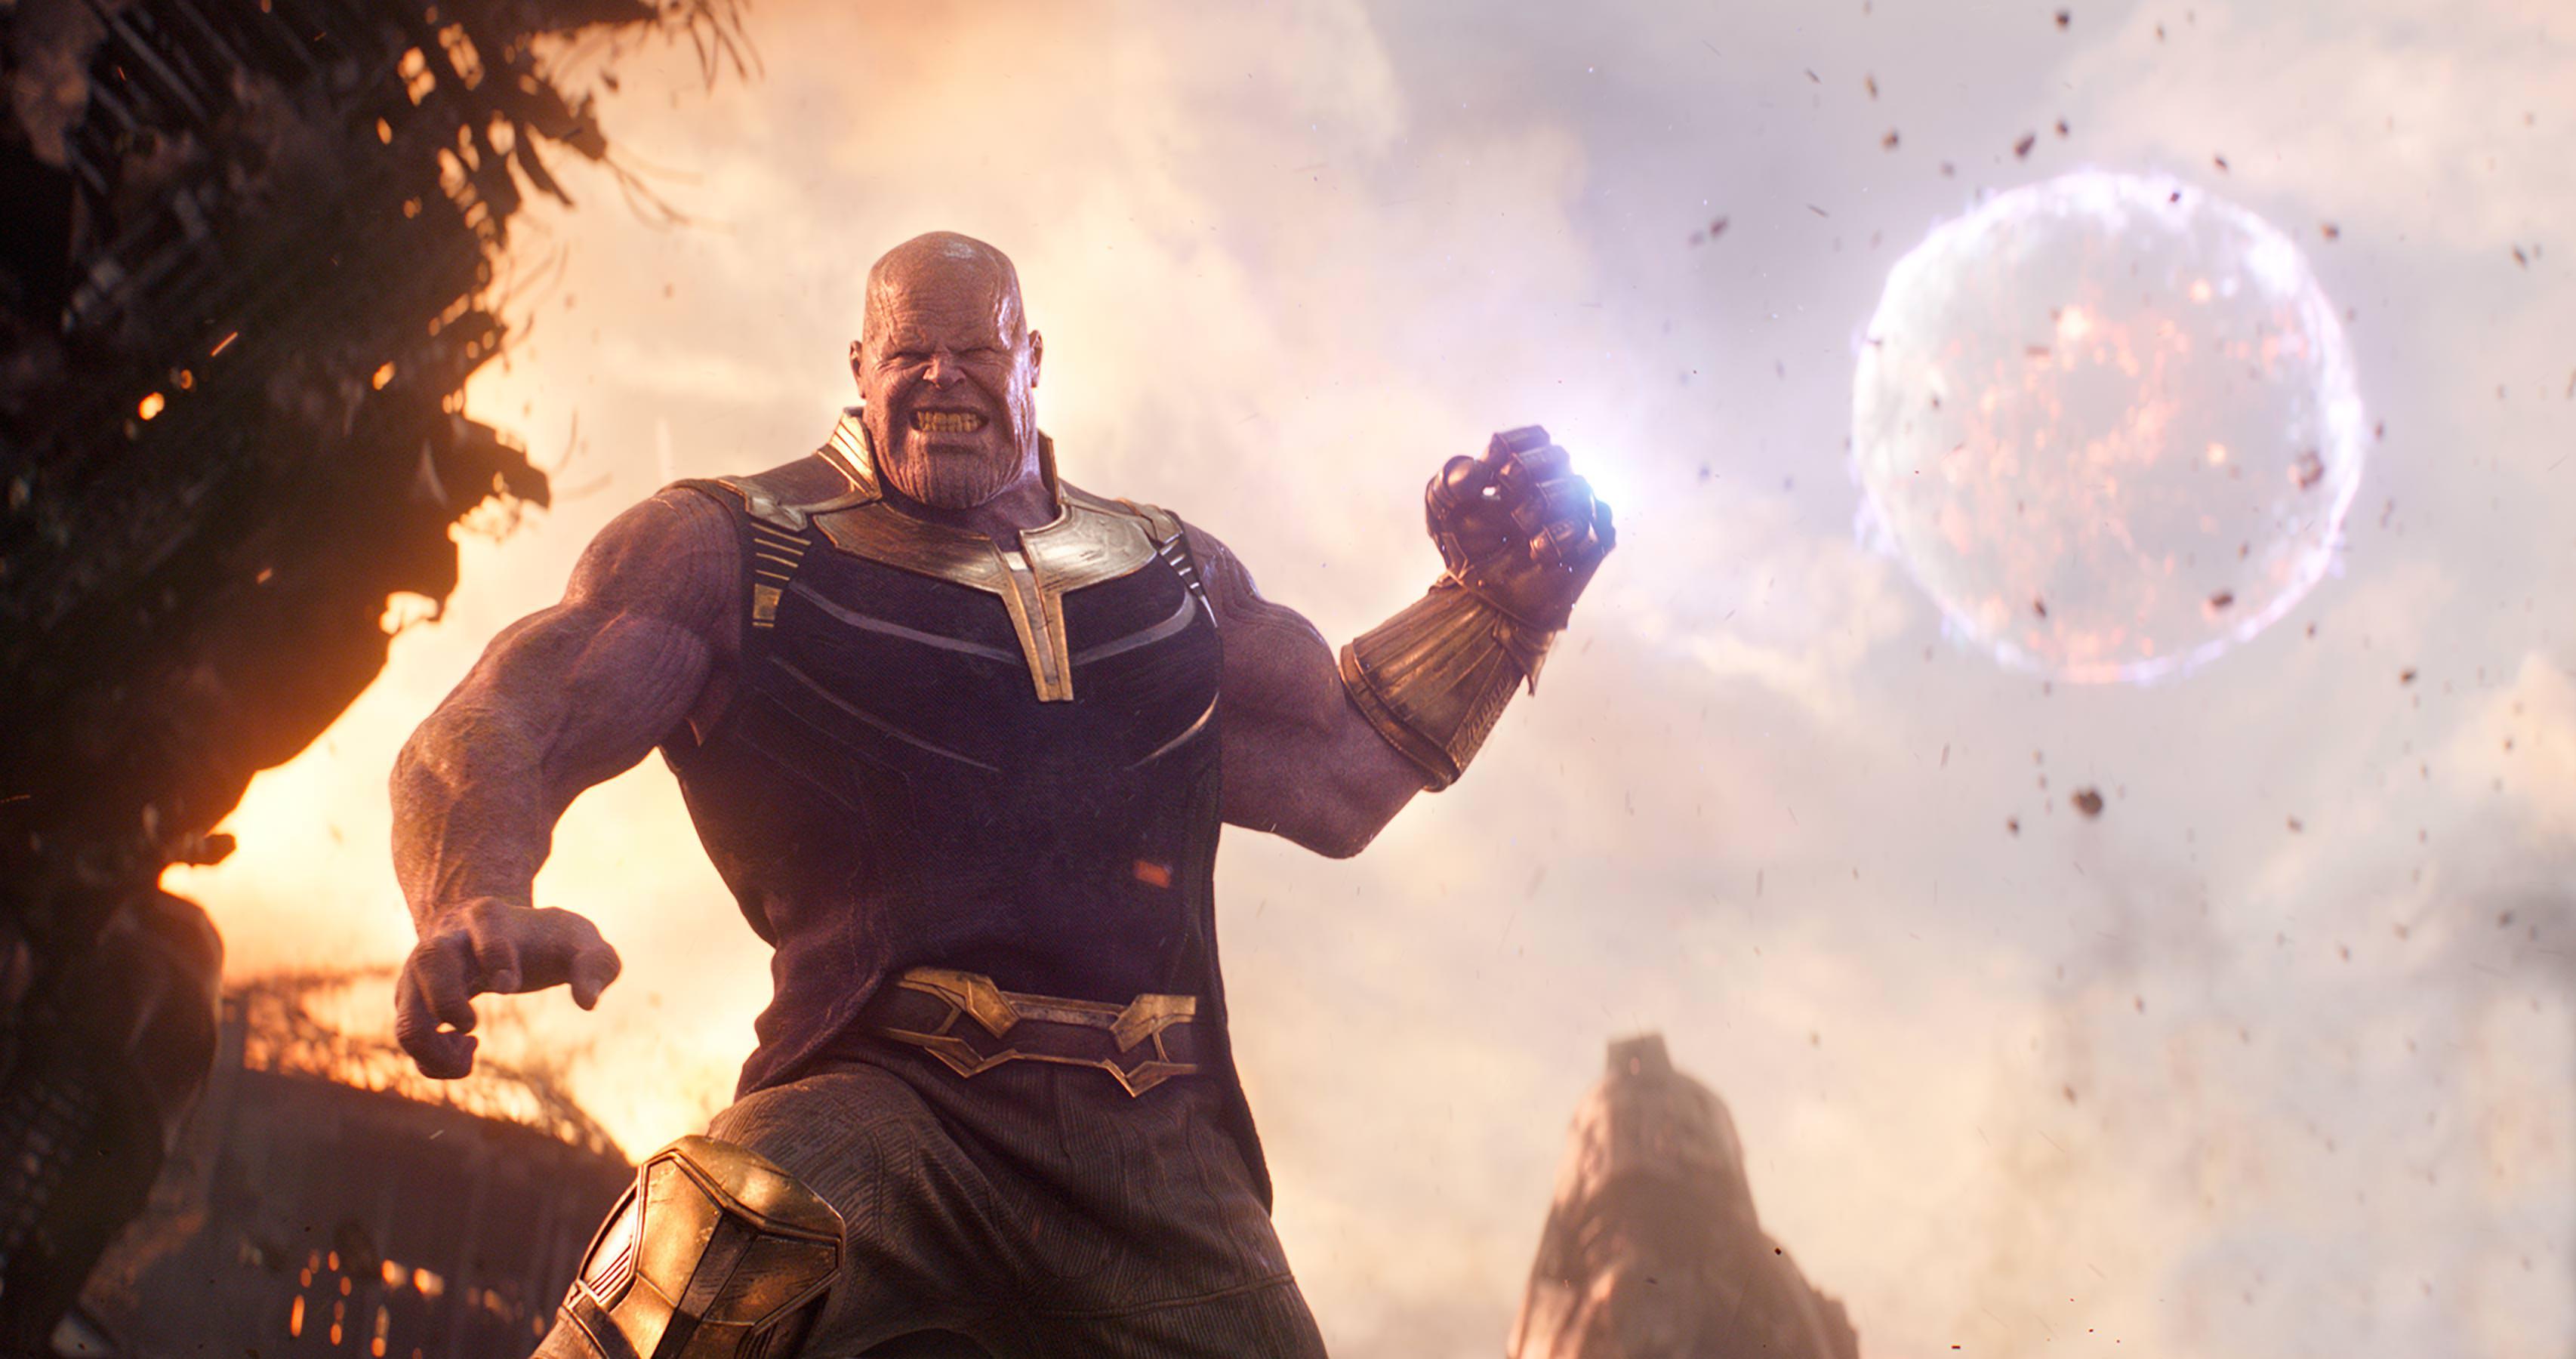 Infinity War Hd >> Wallpaper : Thanos, Josh Brolin, Avengers Infinity war, Marvel Cinematic Universe, The Avengers ...